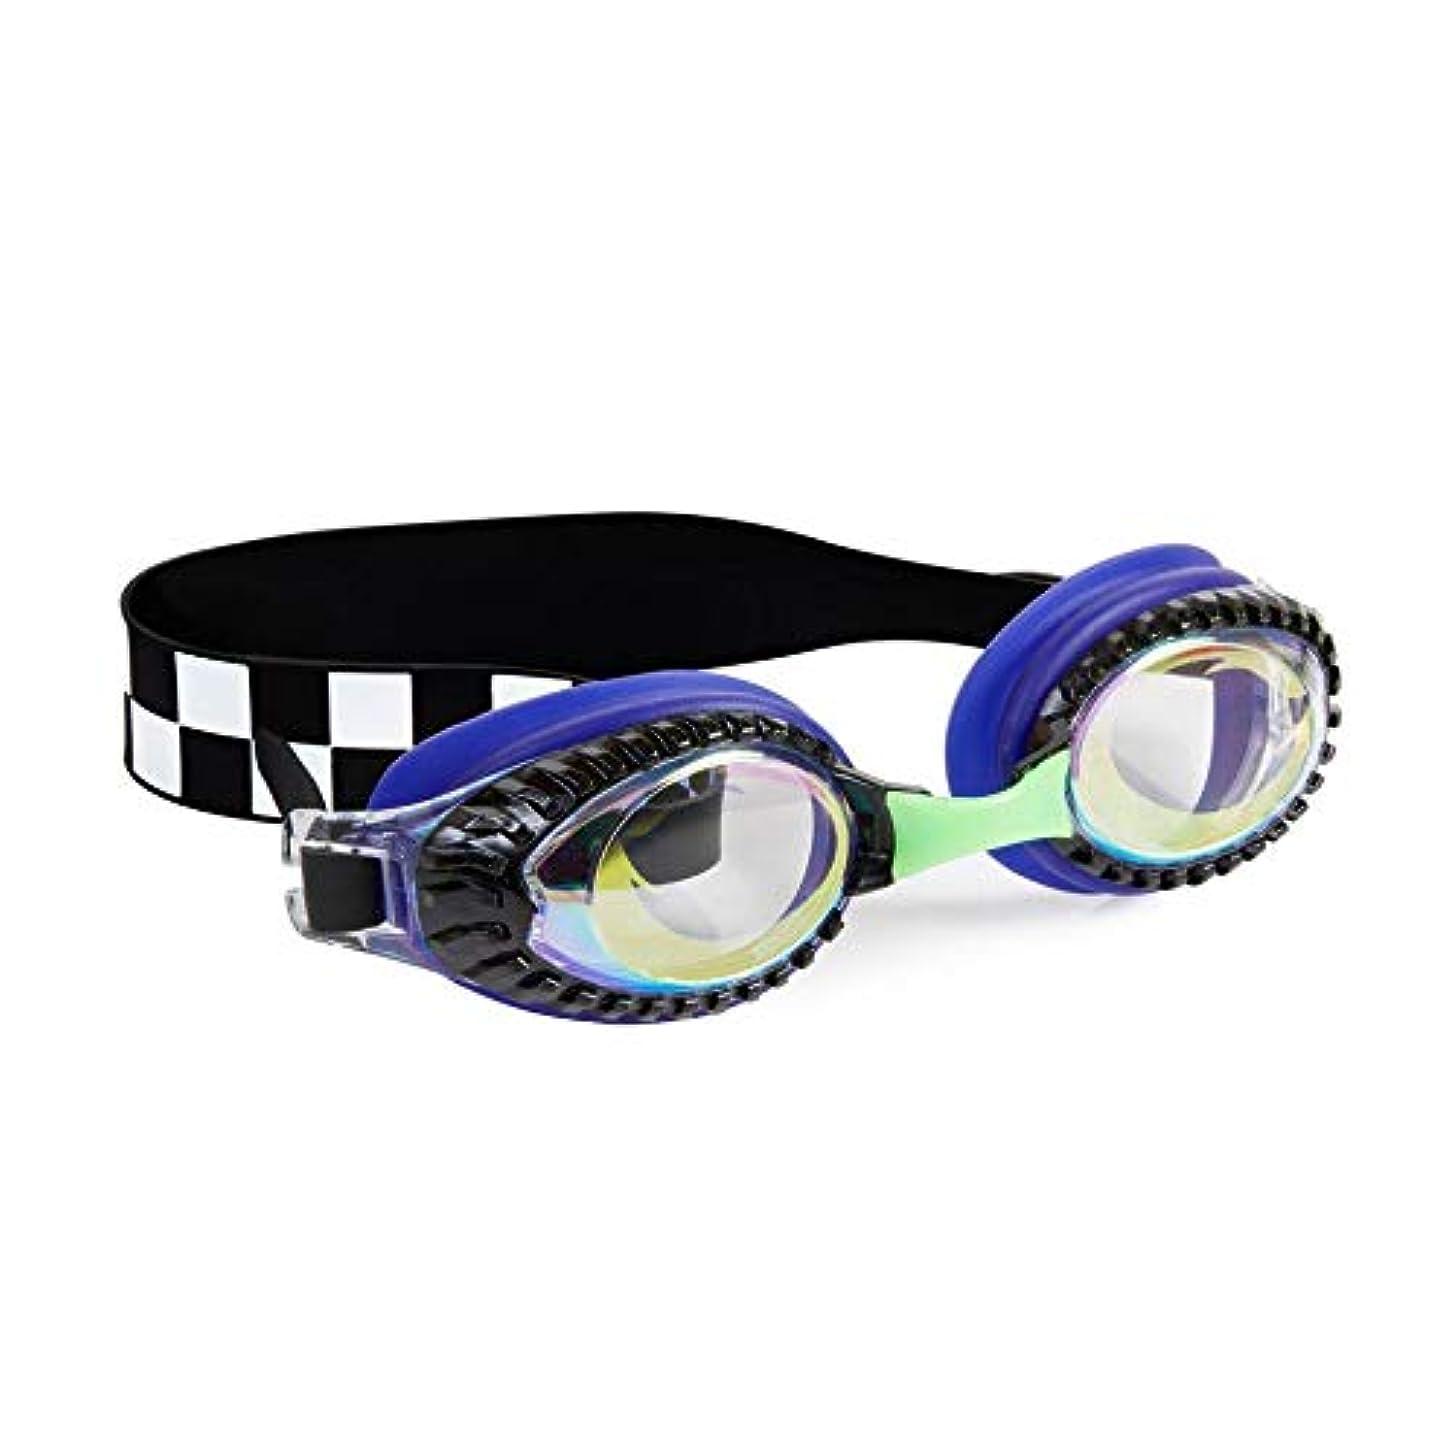 Bling 2O Kids Swimming Goggles - Swim Goggles for Boys - Anti Fog, No Leak, Non Slip, UV Protection with Hard Travel Case - 8+